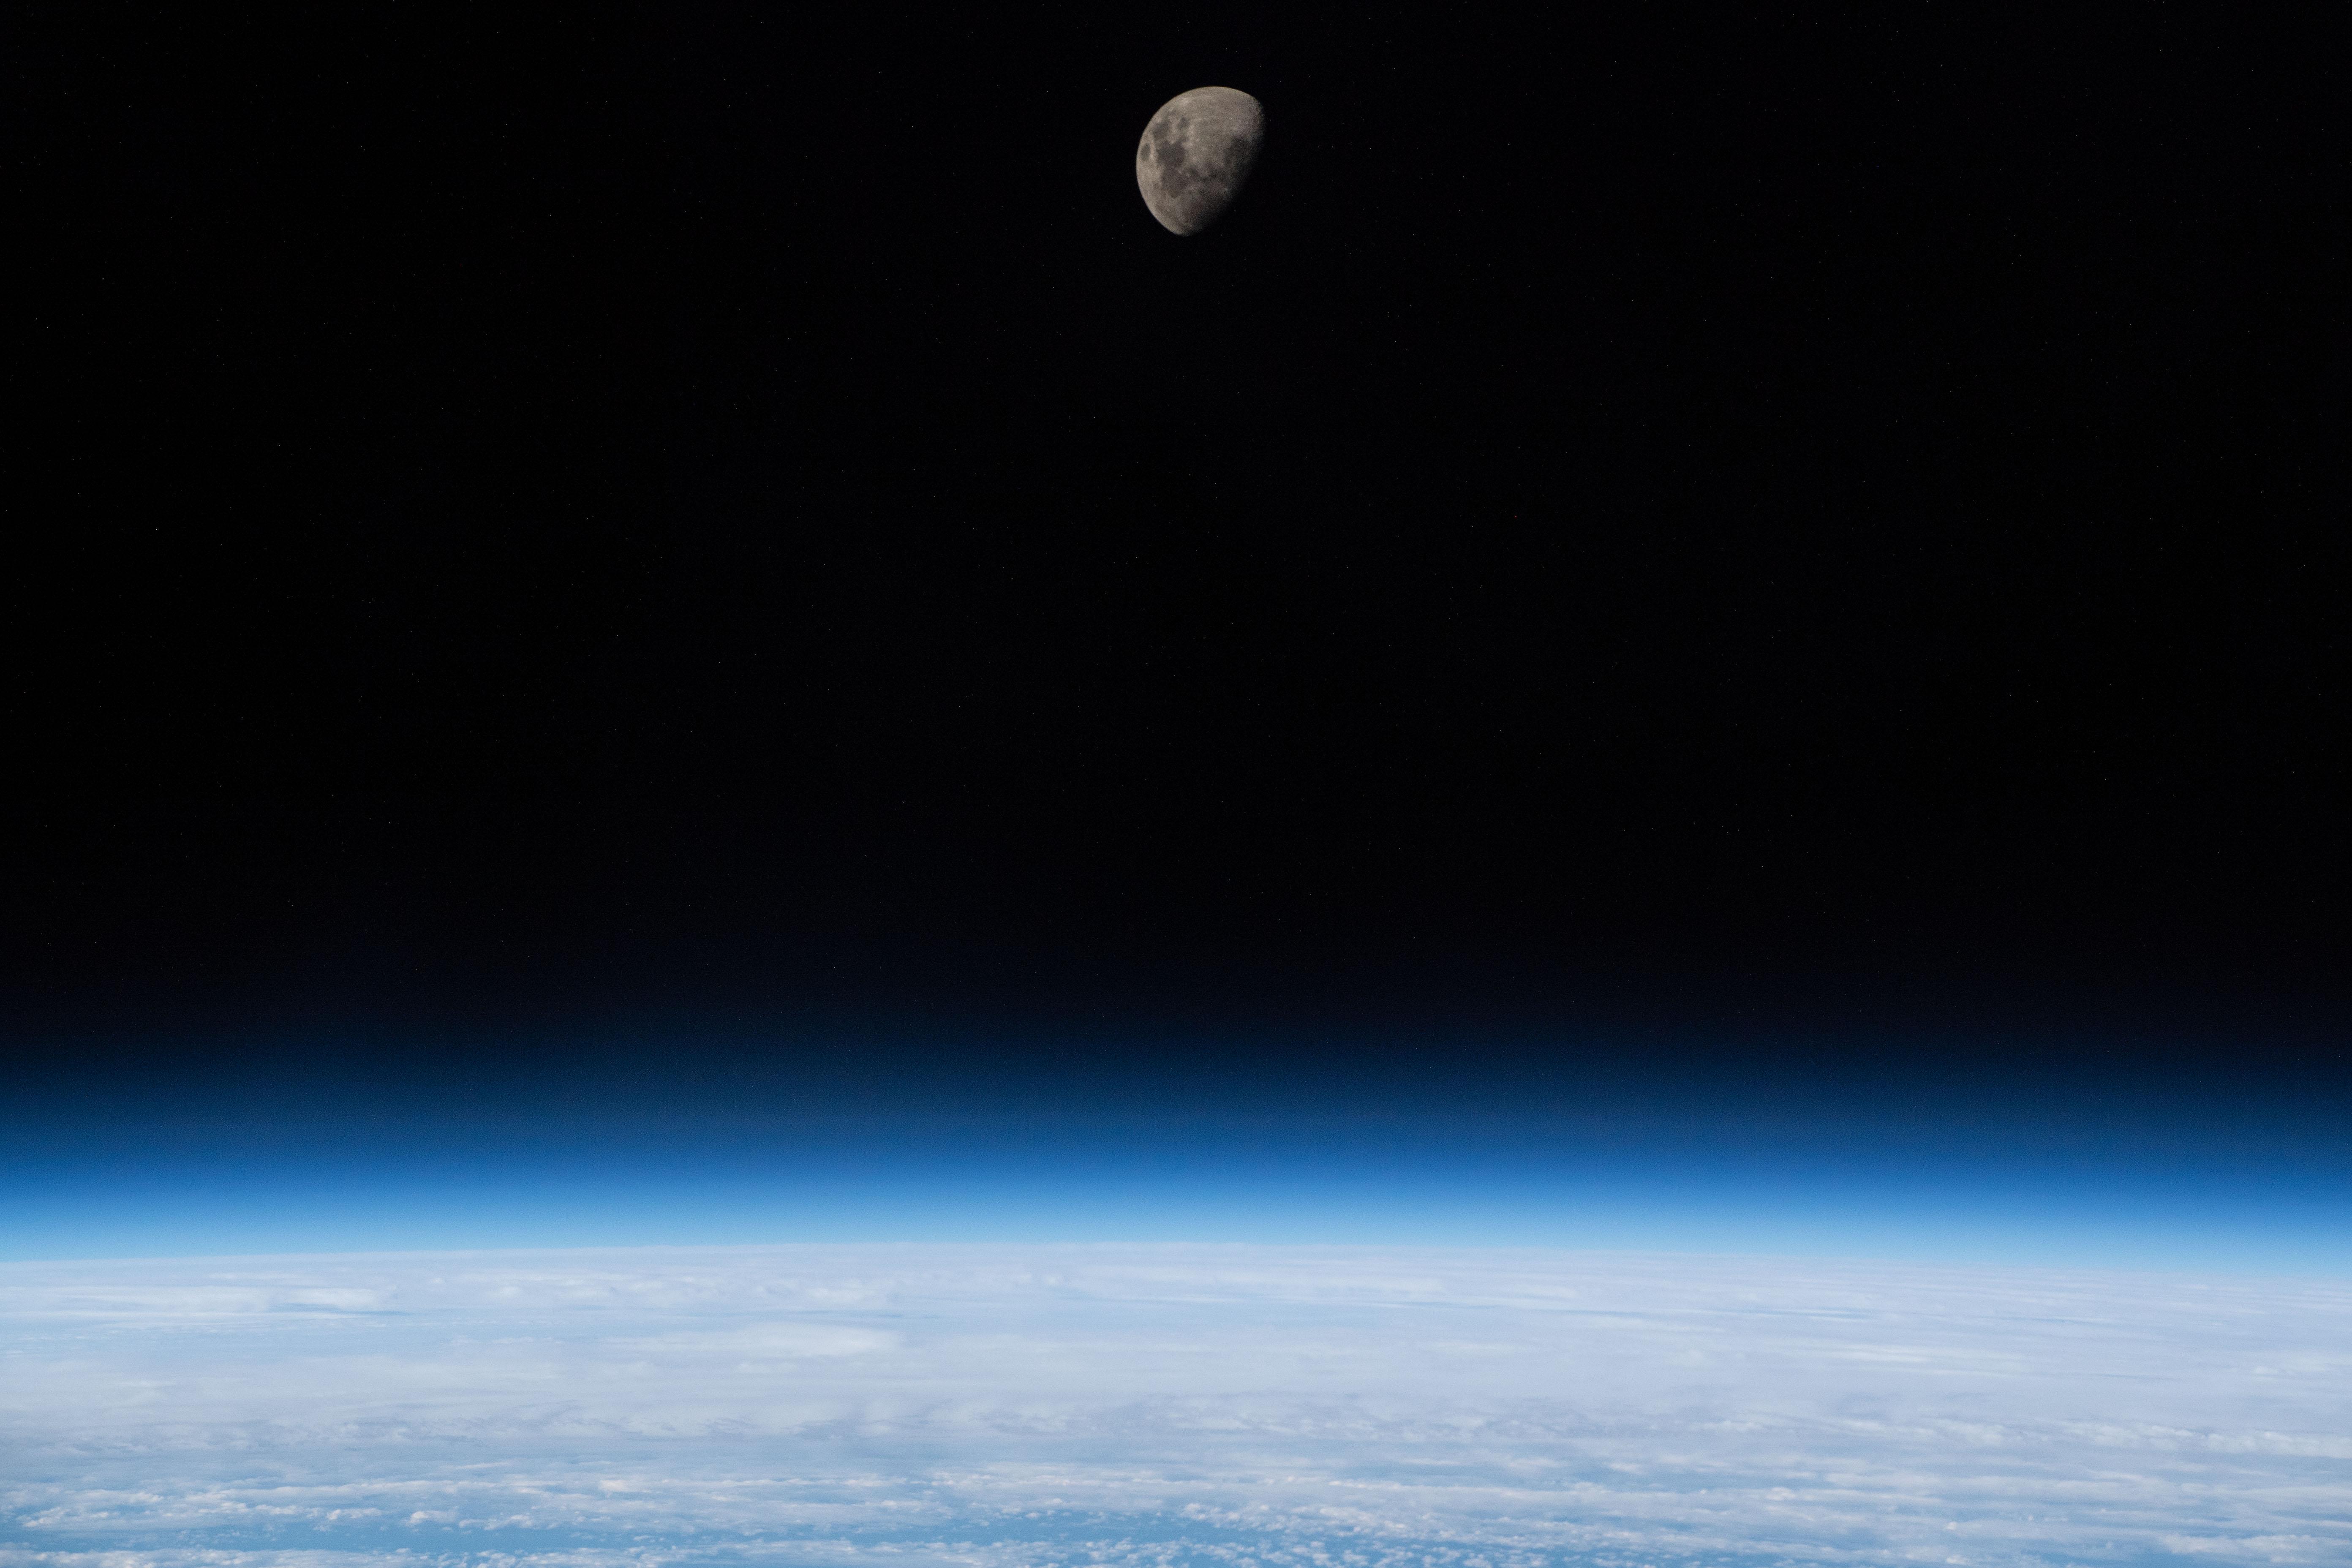 Waxing Gibbous Moon Above Earth's Limb